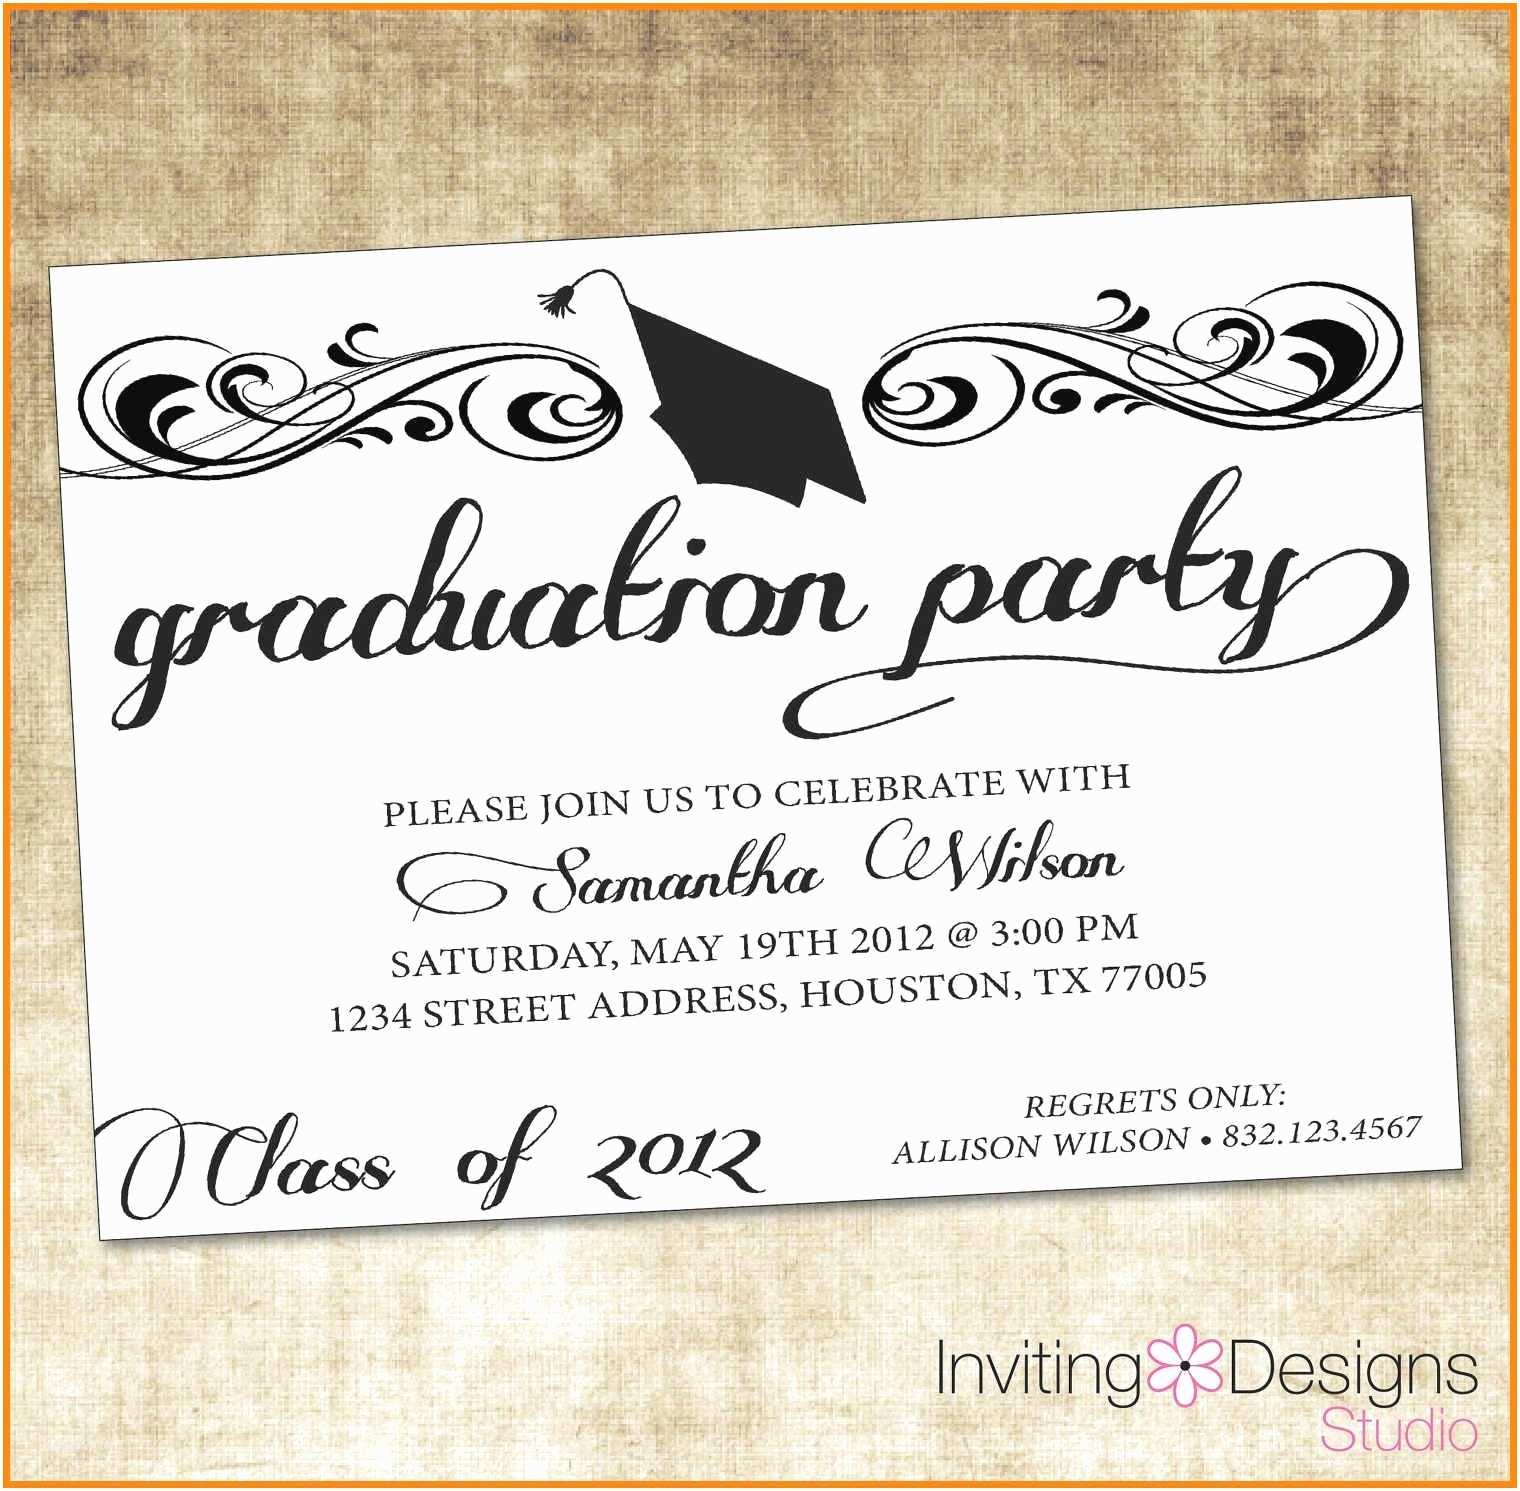 Free Graduation Party Invitation Templates Free Graduation Party Invitation Templates for Word